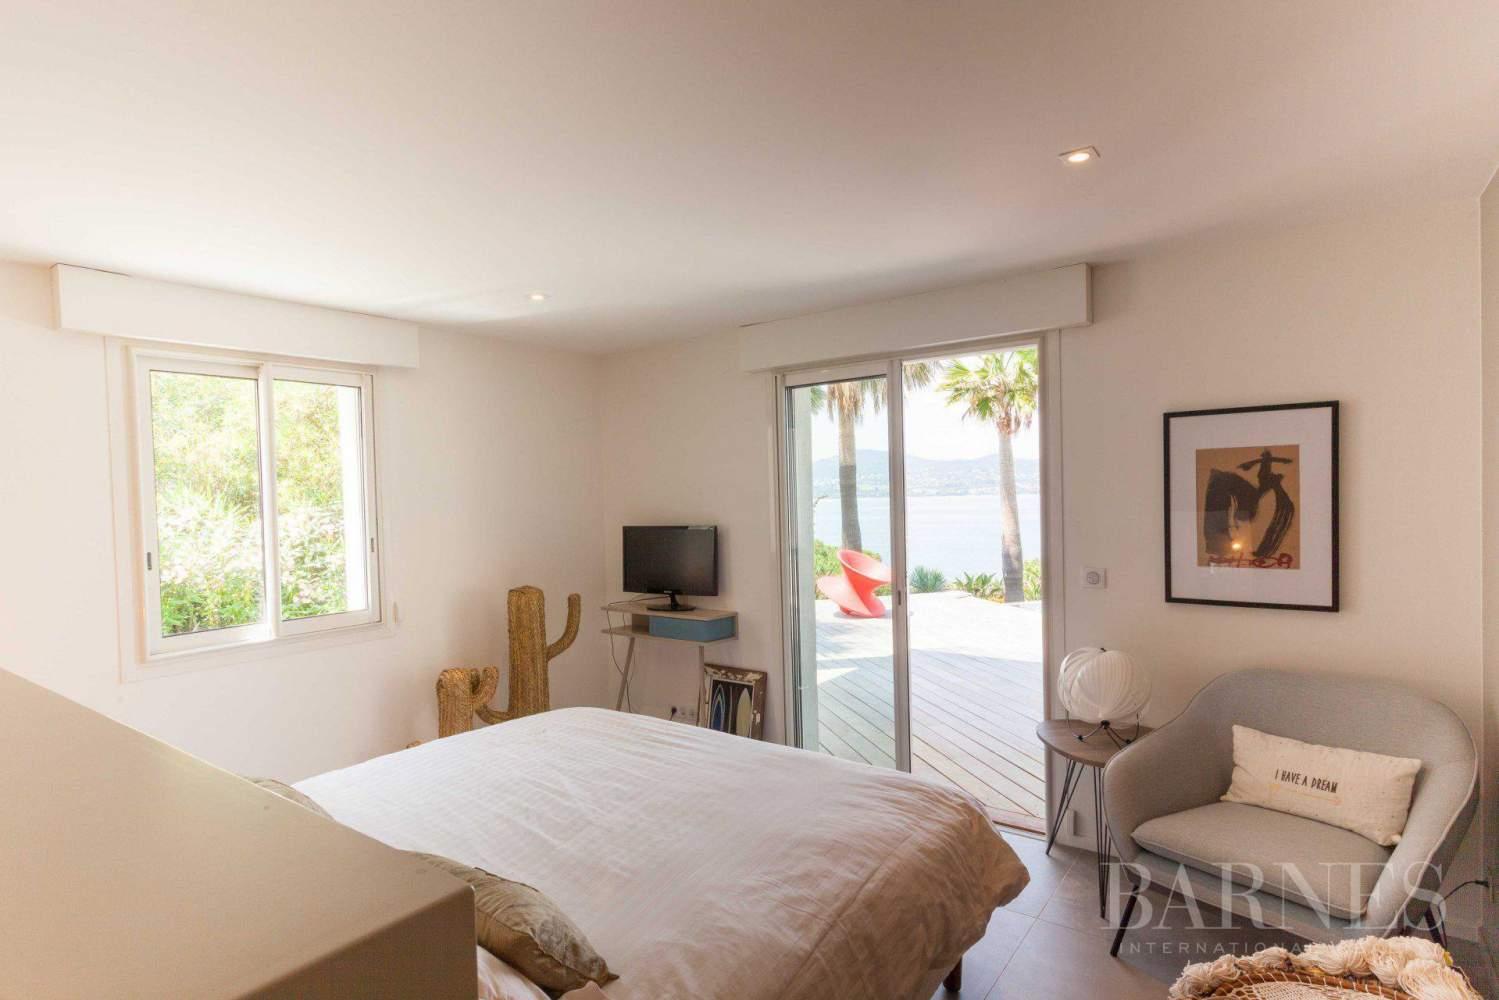 GASSIN - Contemporary house near Saint-Tropez, sea view picture 14